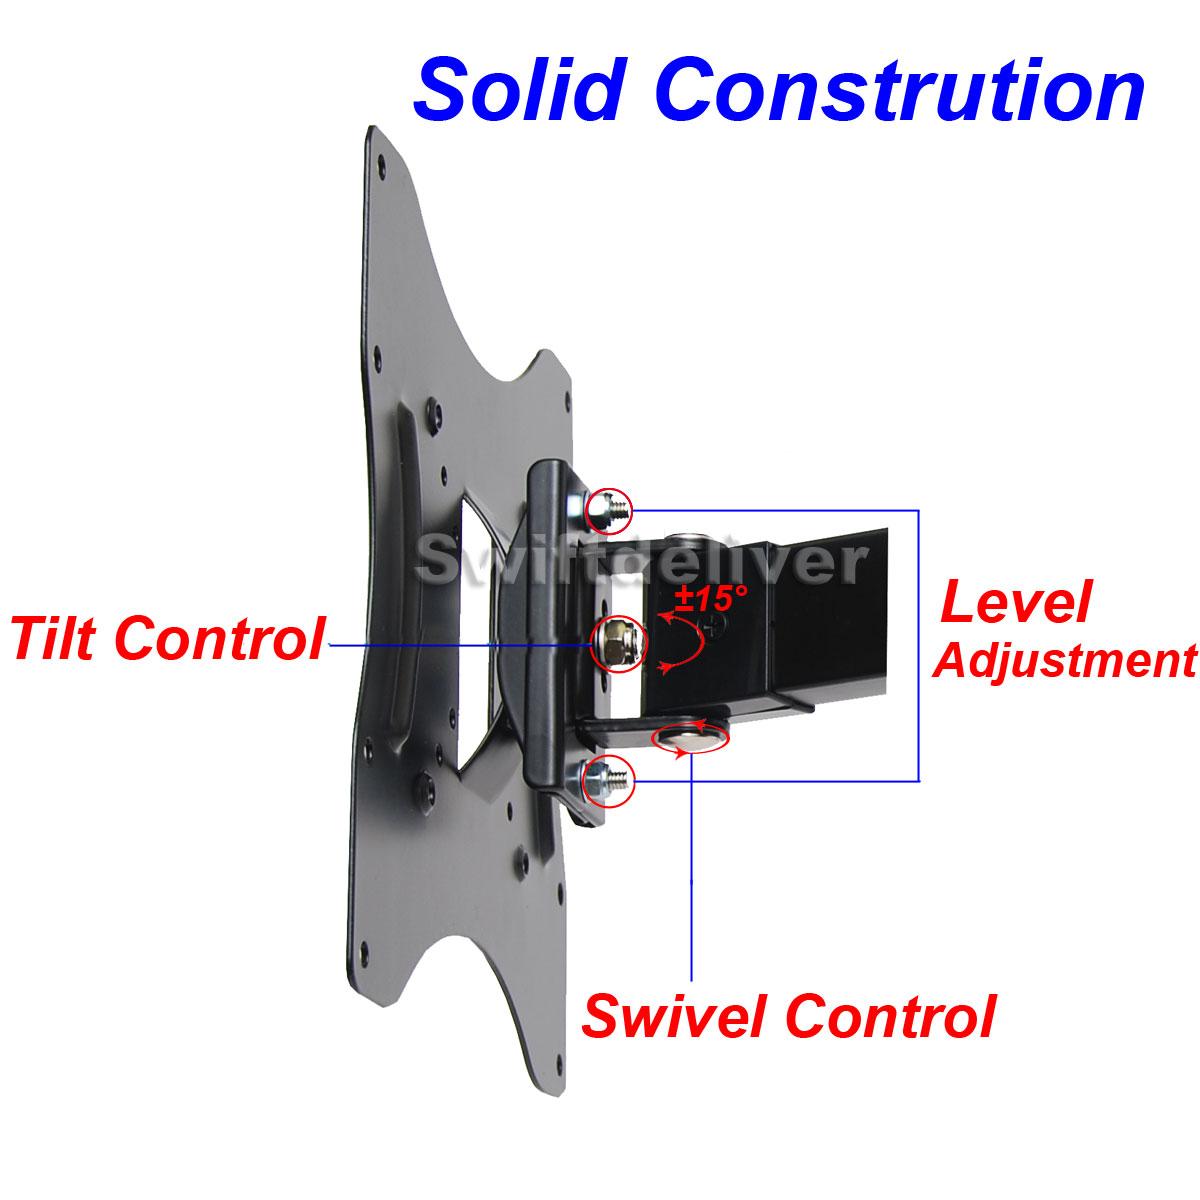 Articulating Tilt Swivel TV Monitor Wall Mount LCD LED22 23 24 26 32 37 40 42CY8